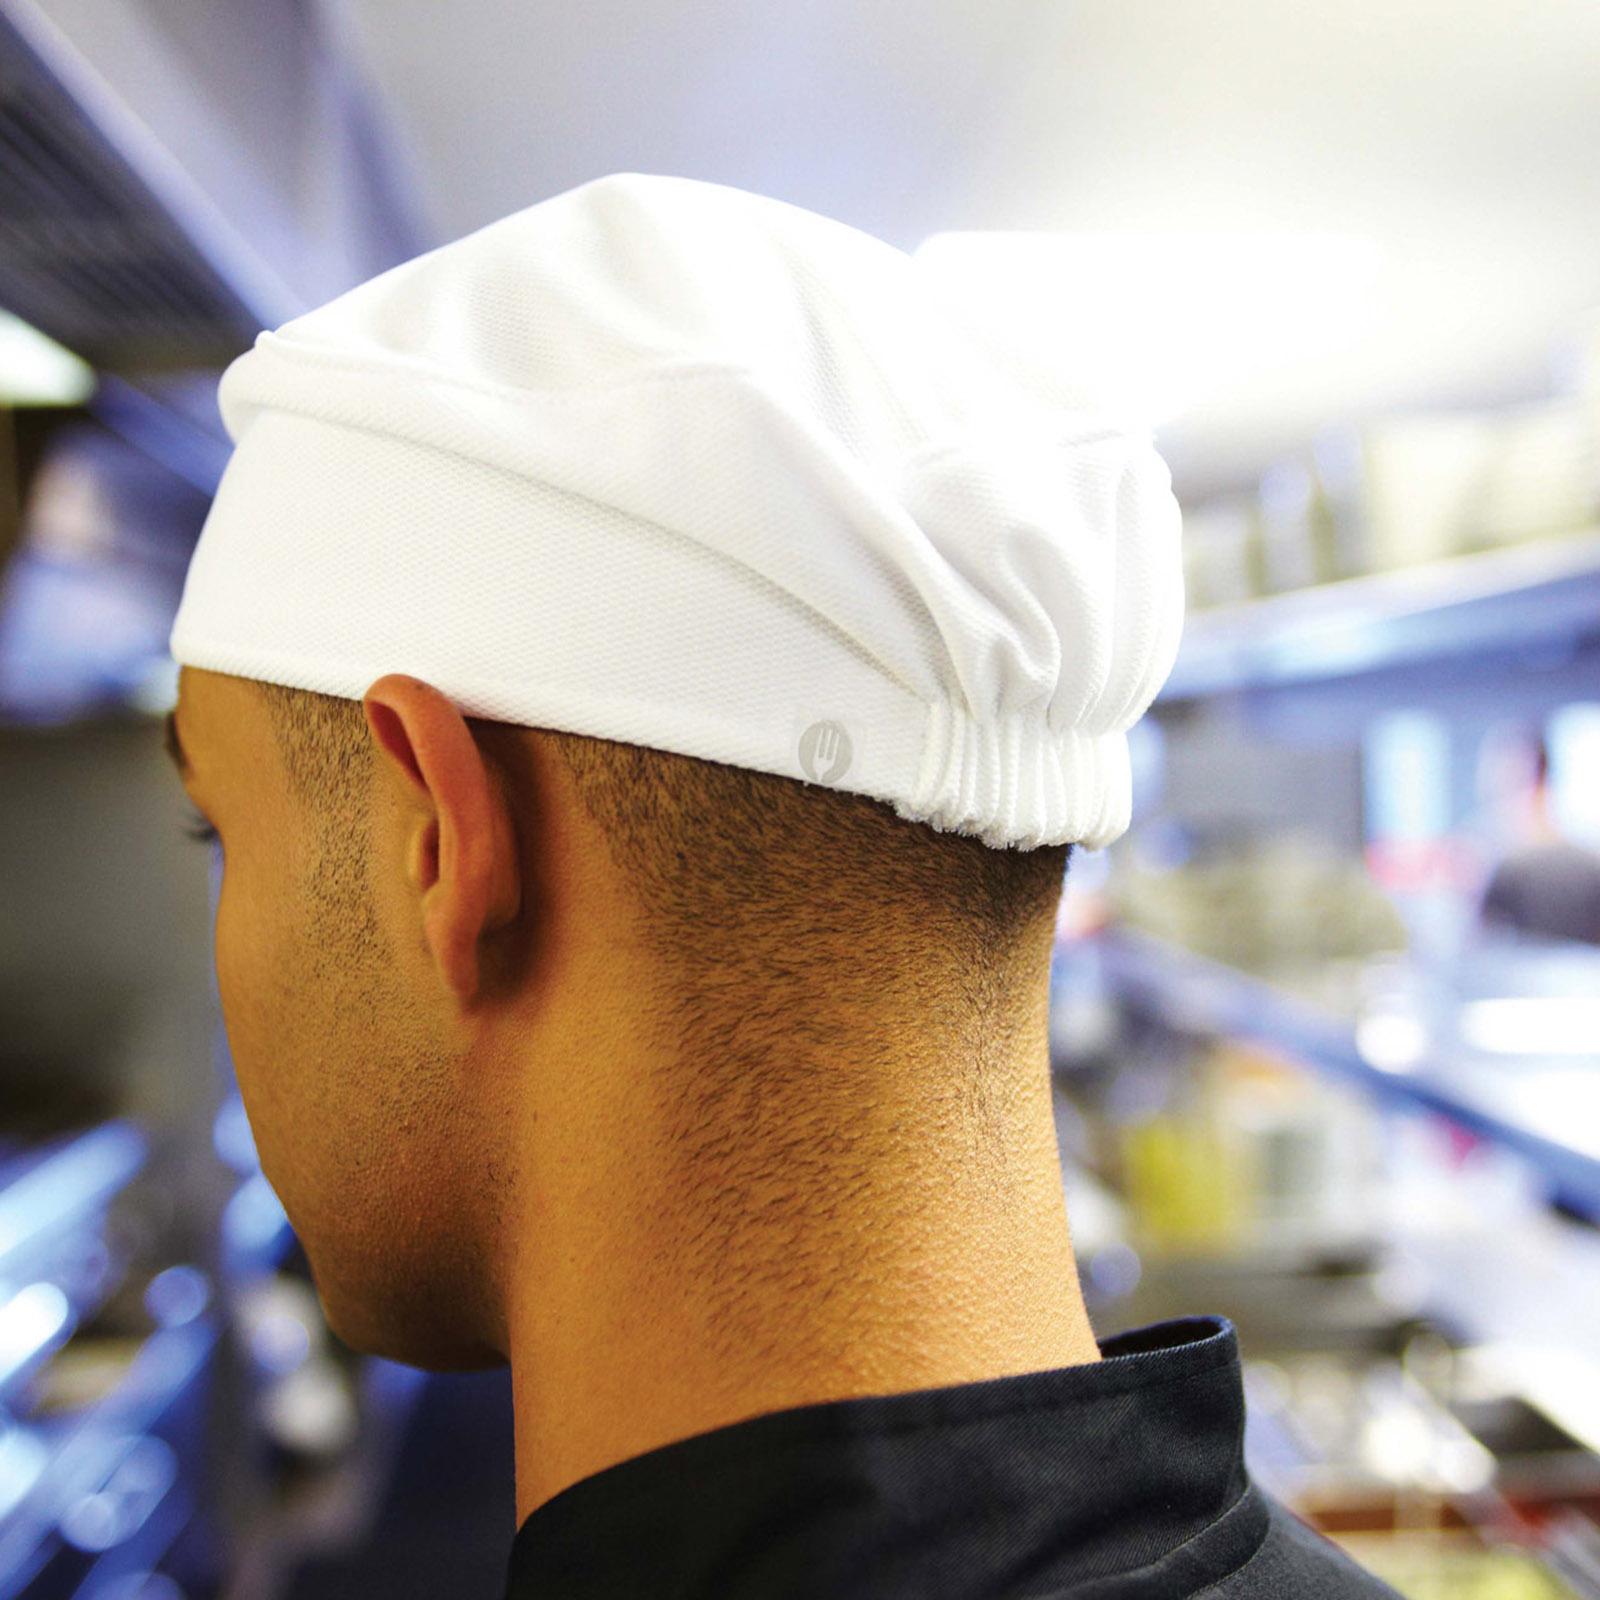 Chef Works DFAOWHTLXL chef's hat